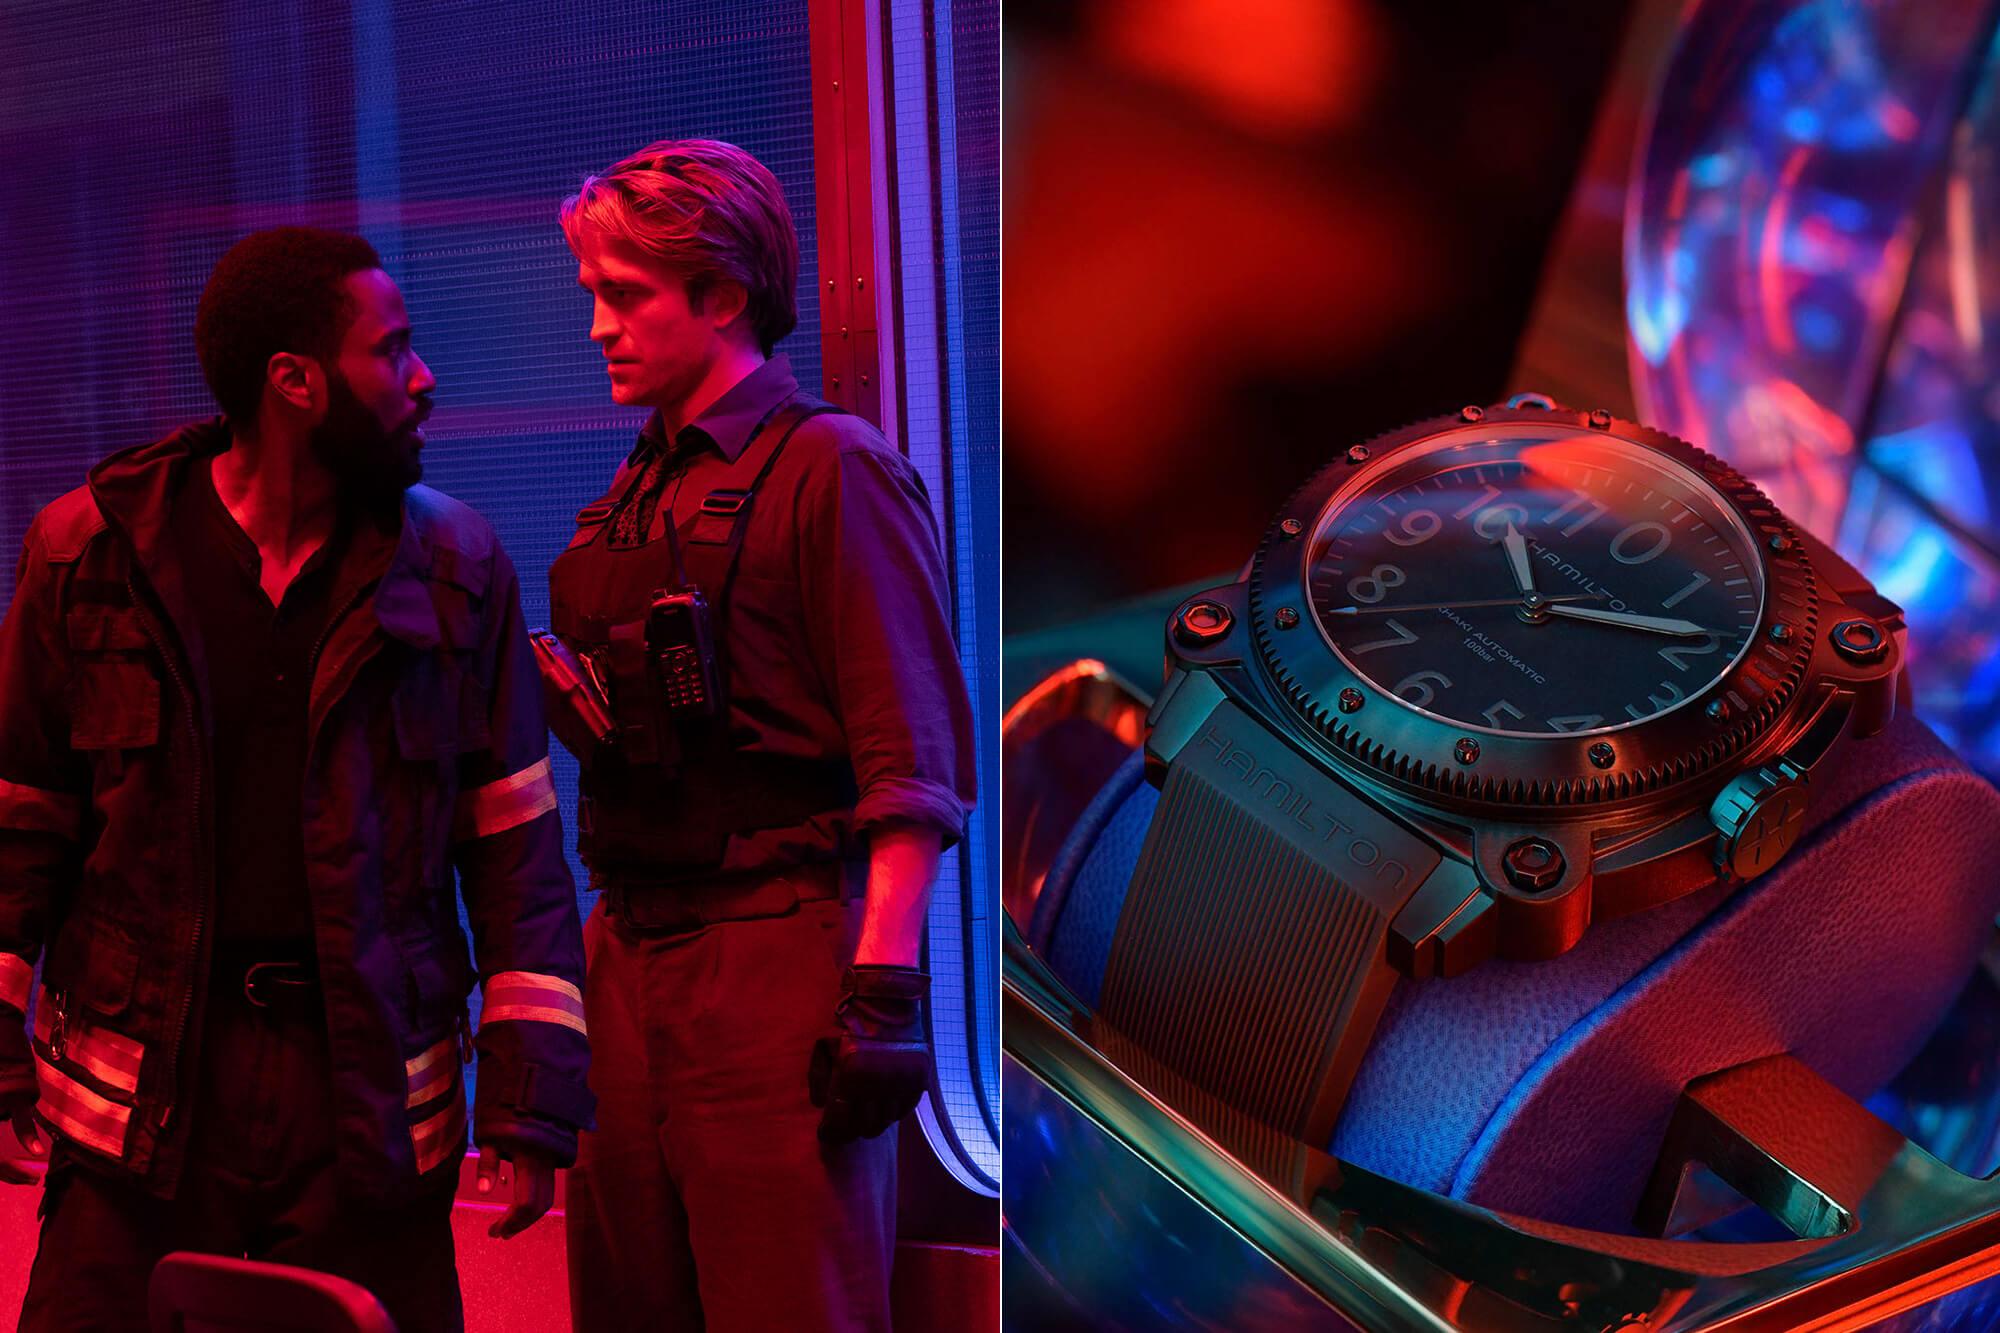 Movie Watch The Hamilton Limited Edition Khaki Navy Belowzero In Tenet 2020 Oracle Time